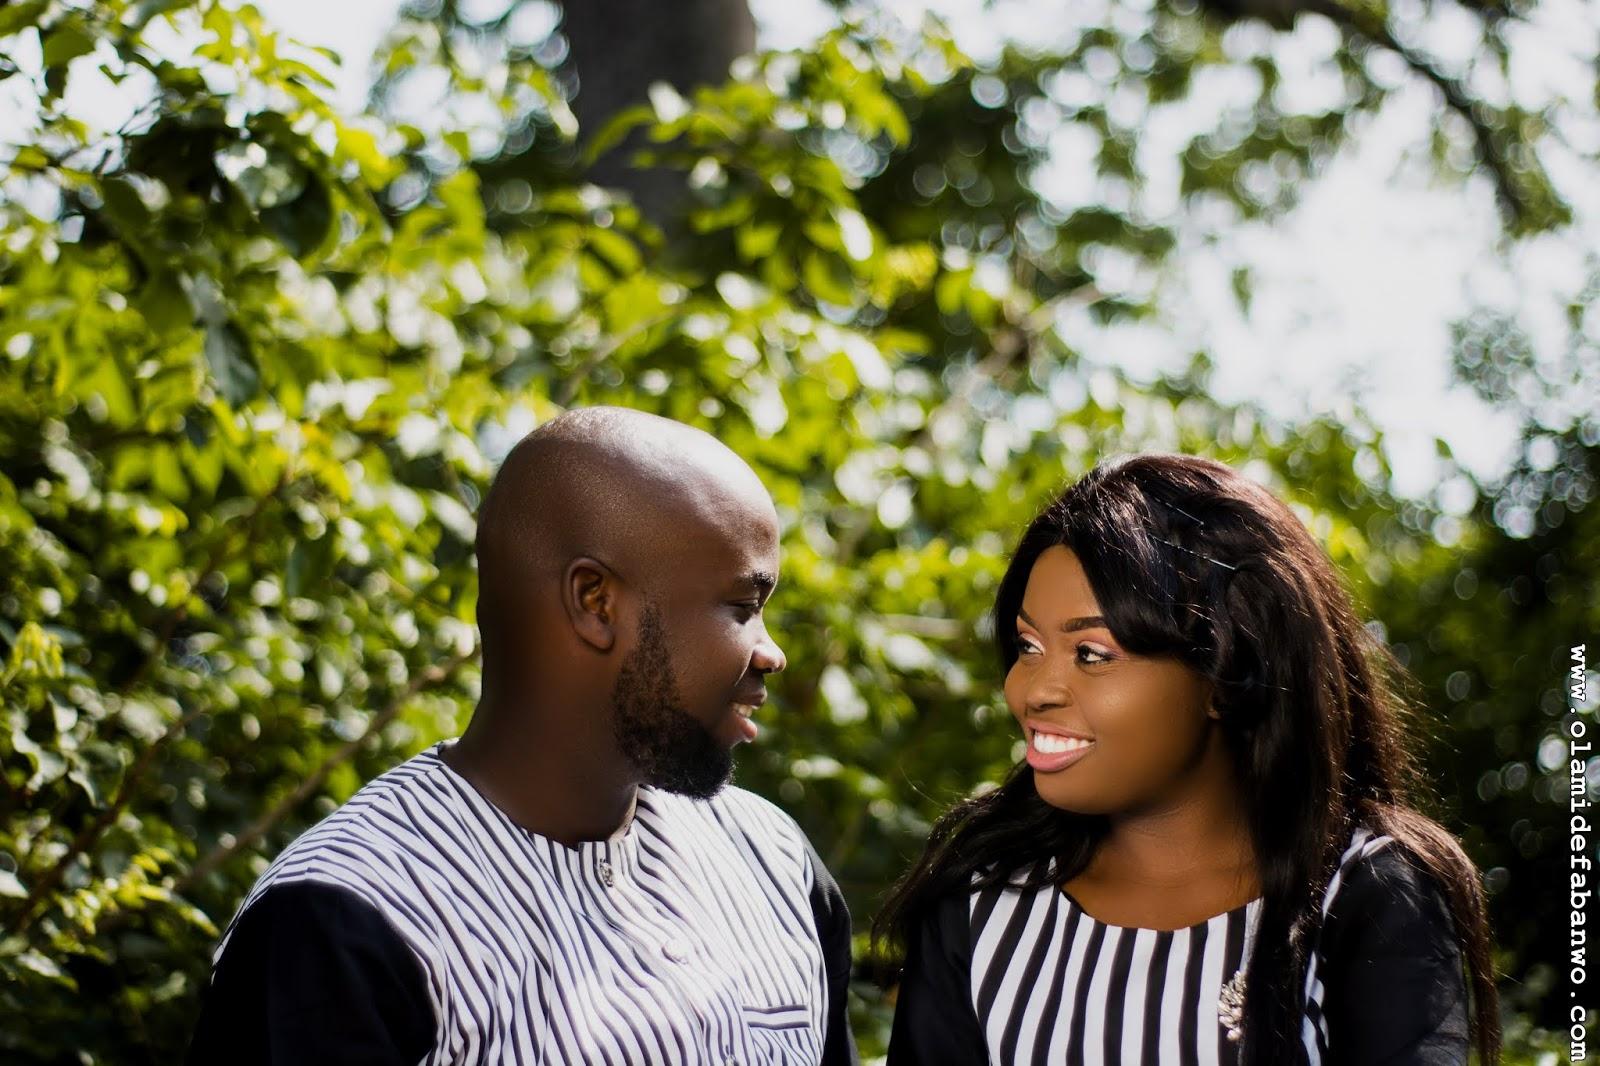 FAIJOSH18 Pre-Wedding Photos (Attire II & III) - Olamide Fabanwo